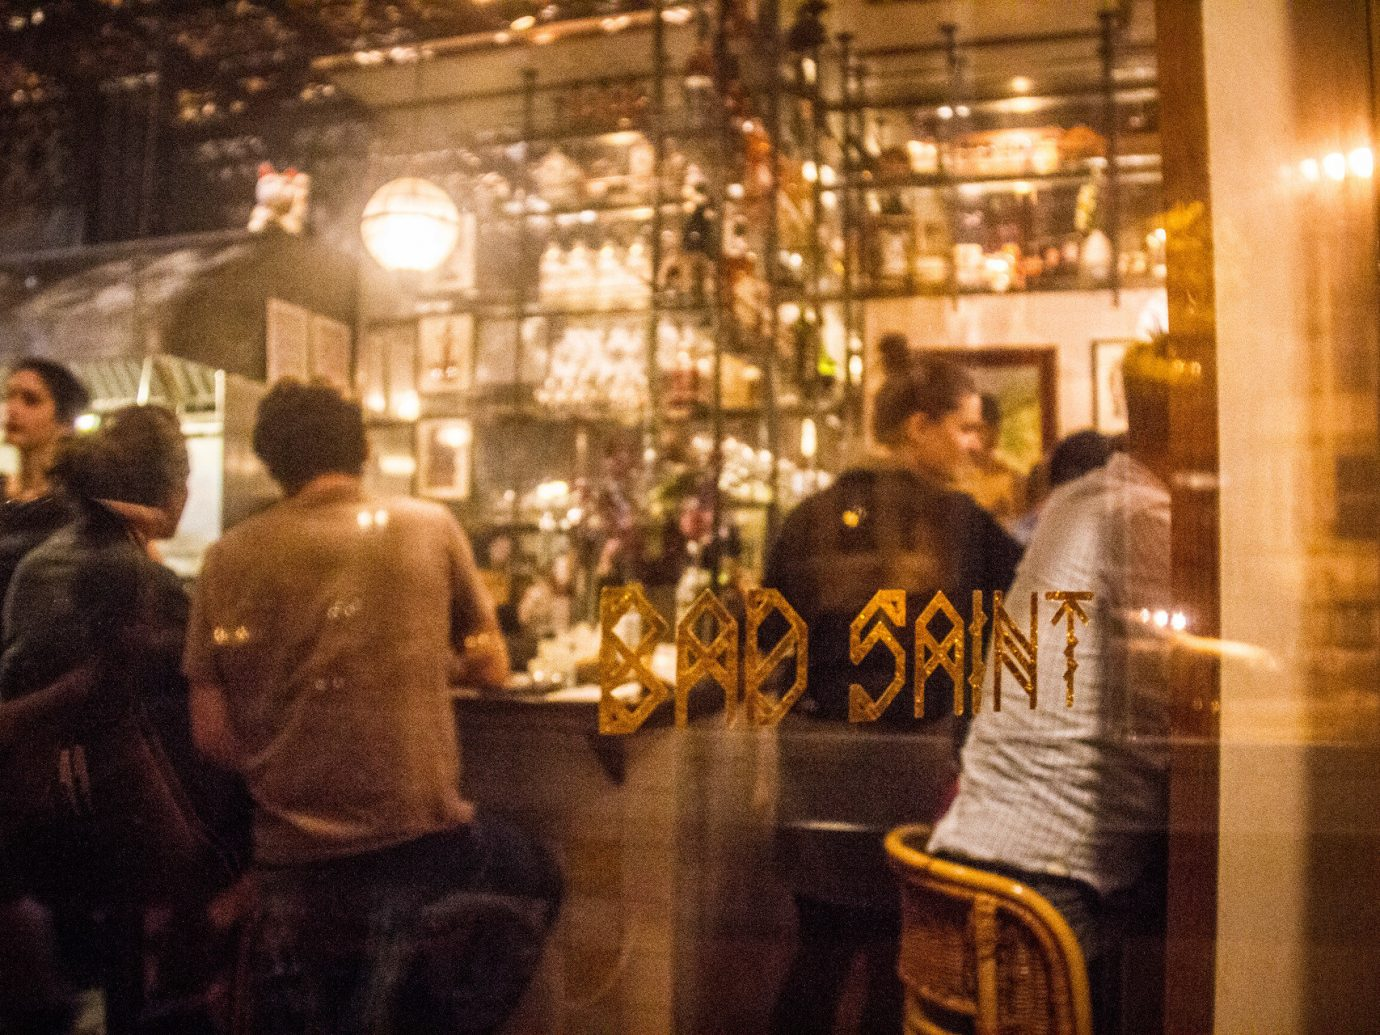 Food + Drink person indoor crowd night street Bar restaurant bazaar shopping